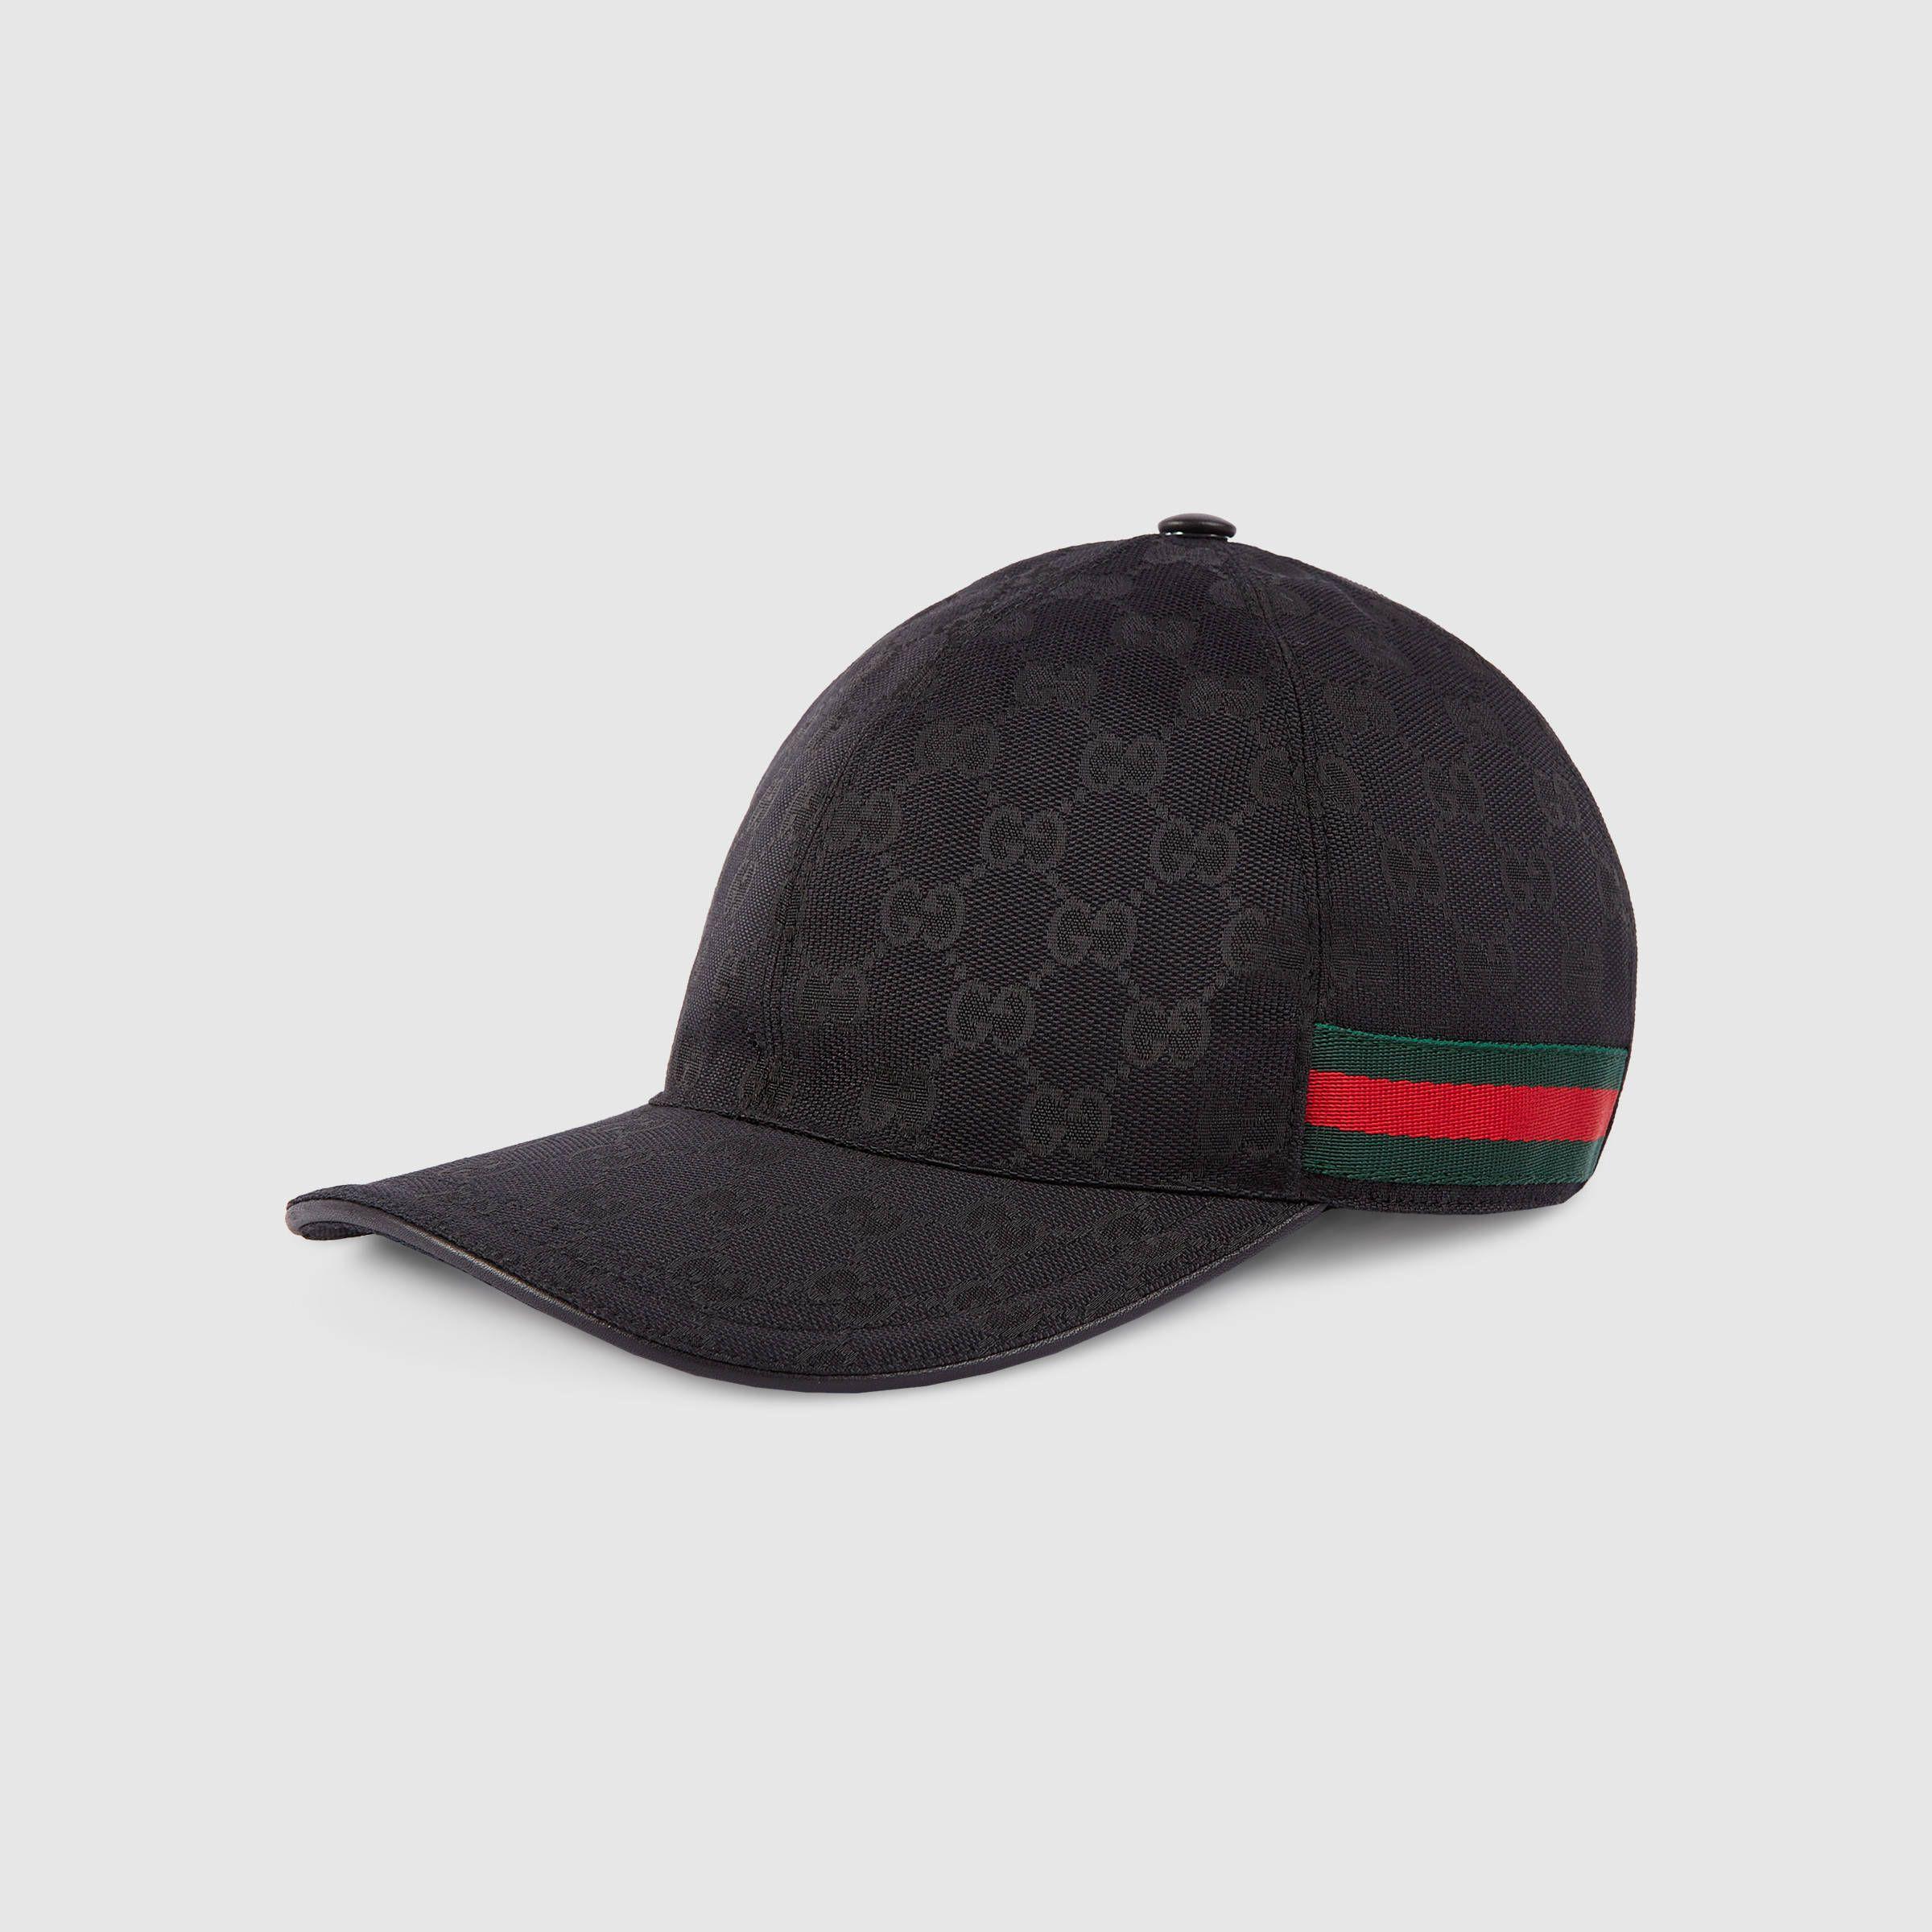 88283cee8 Original GG canvas baseball hat with Web | Gifts | Baseball hats ...